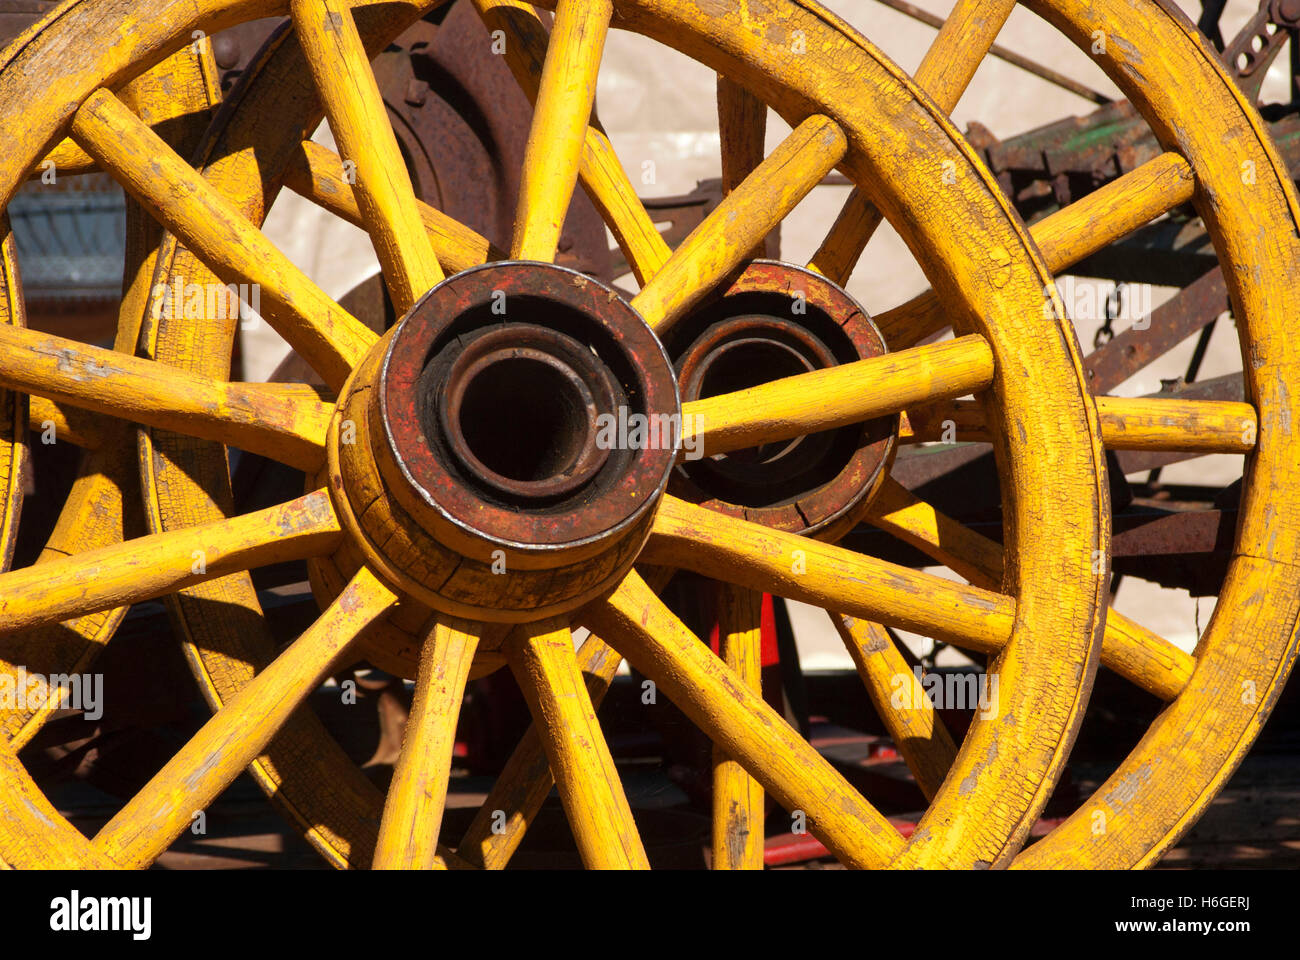 Antique Wagon Wheels Stock Photos & Antique Wagon Wheels Stock ...